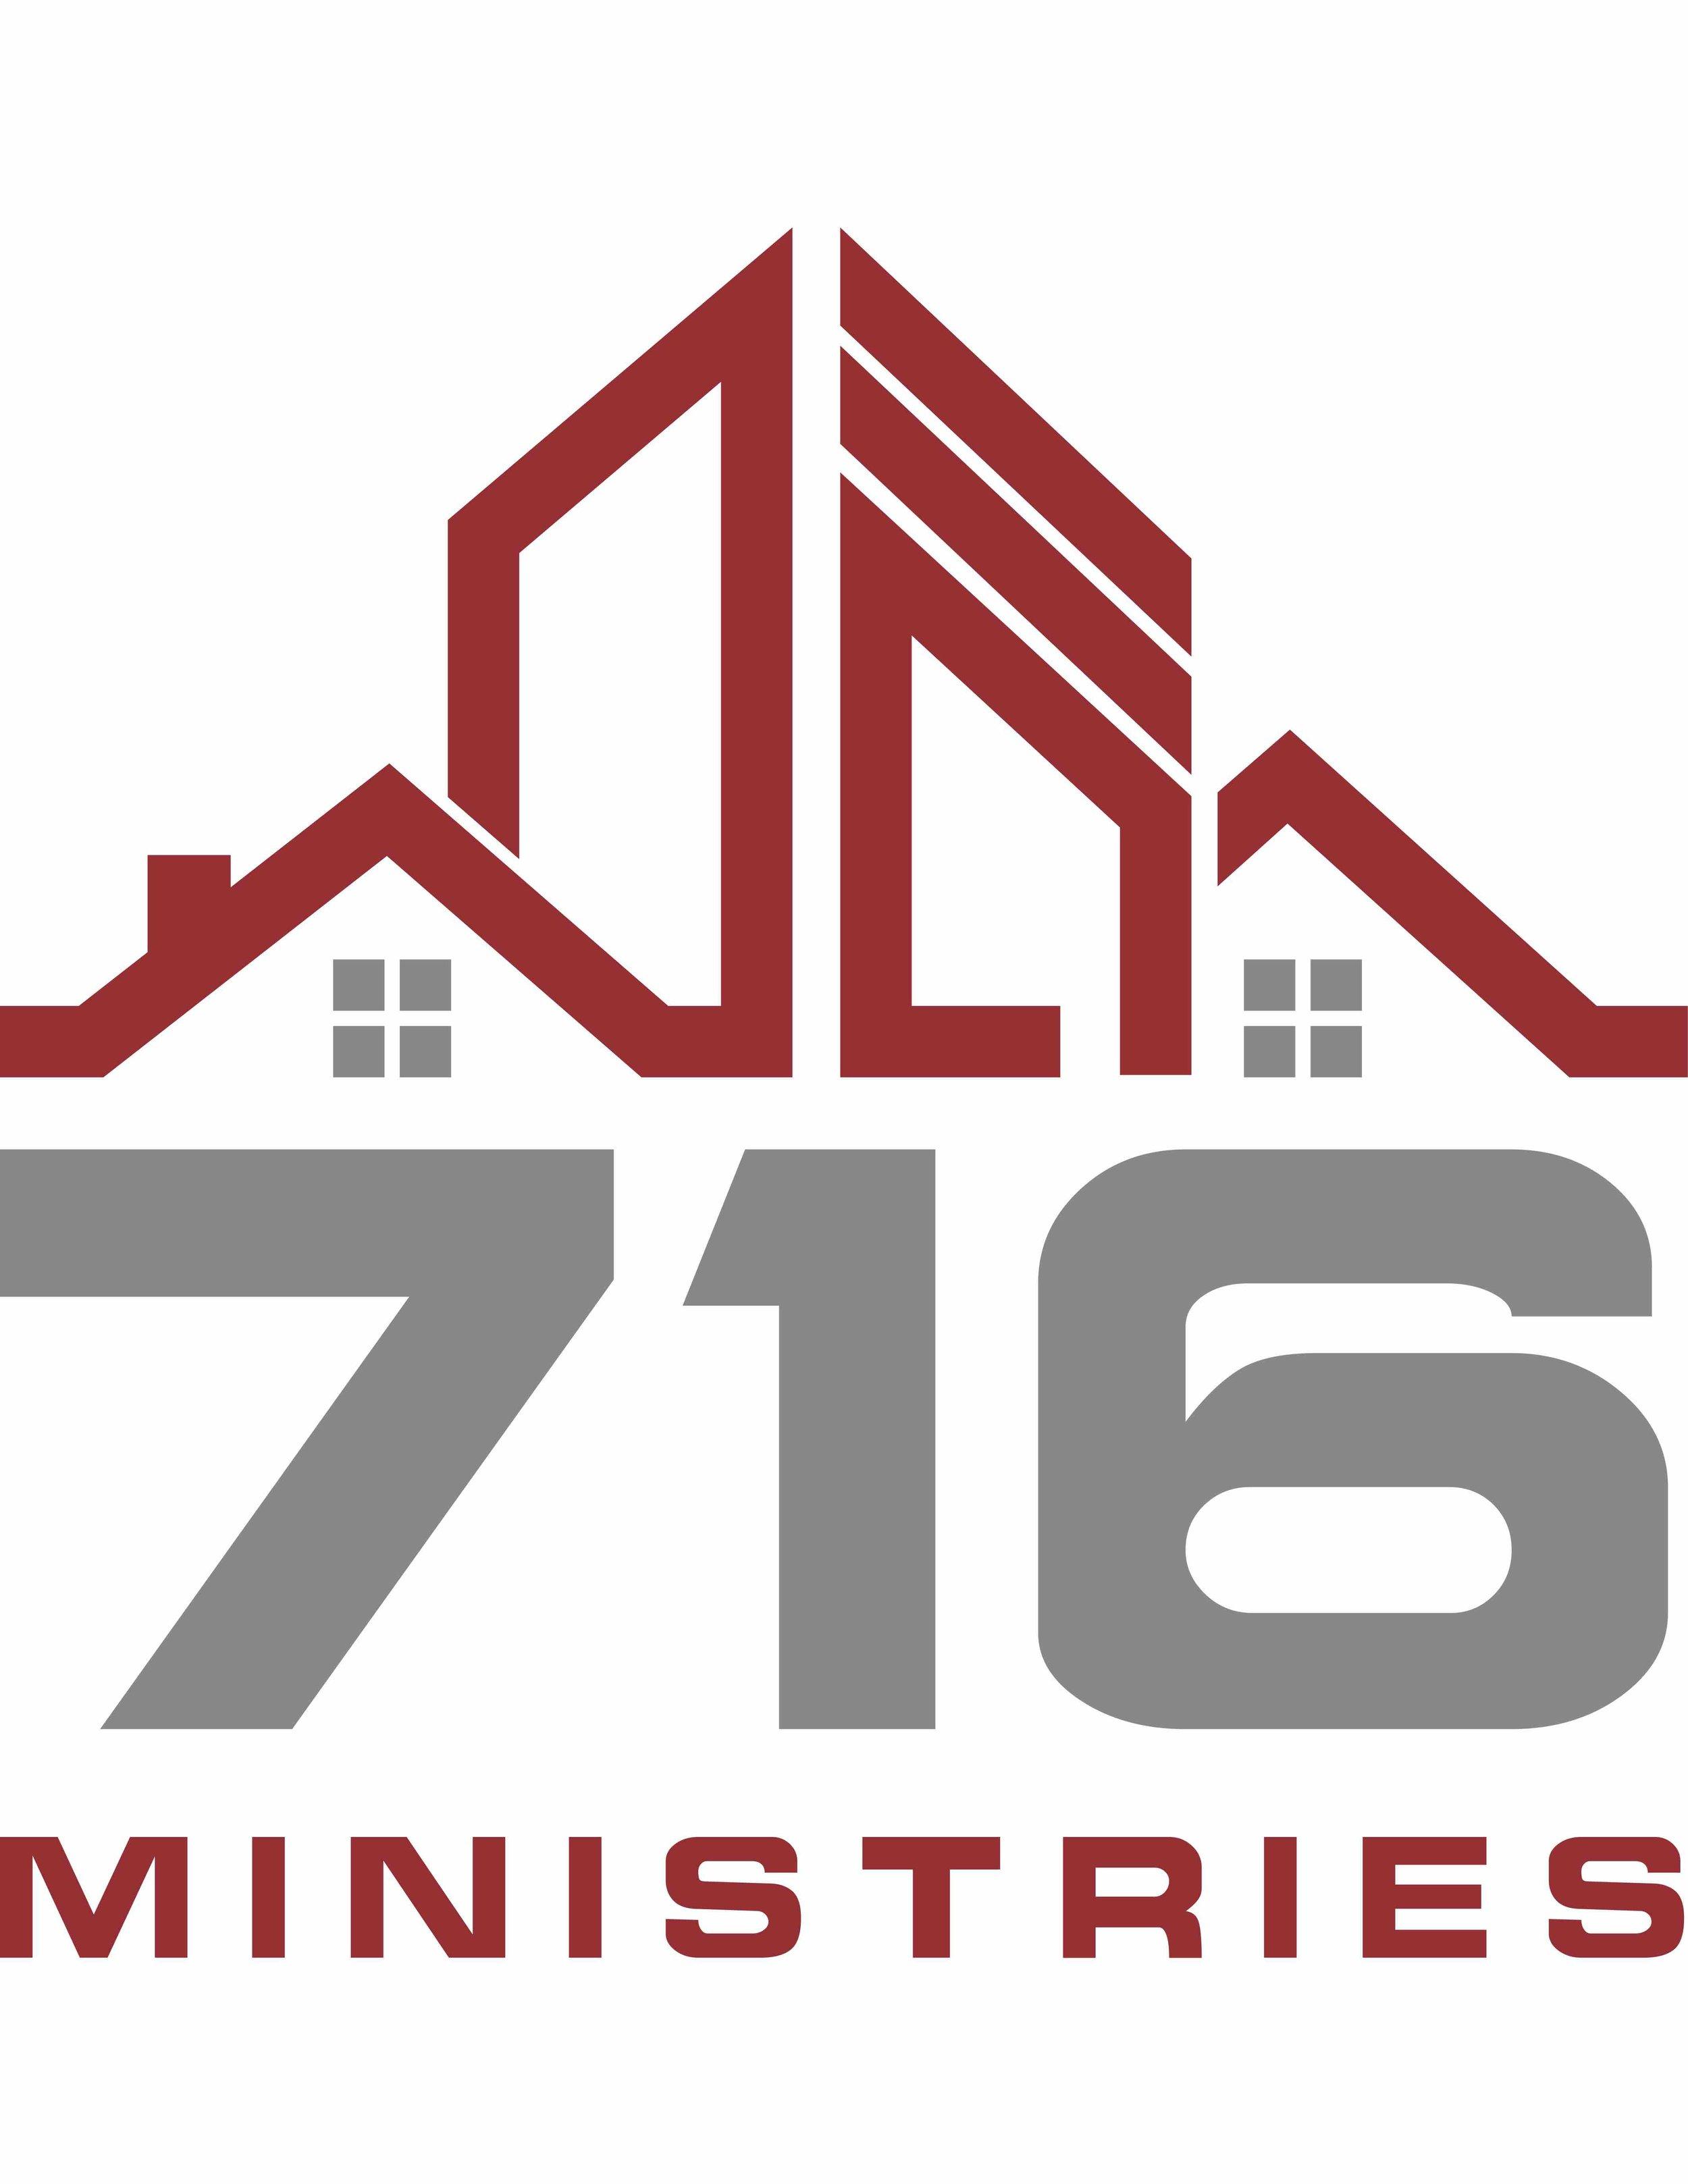 716 Ministries